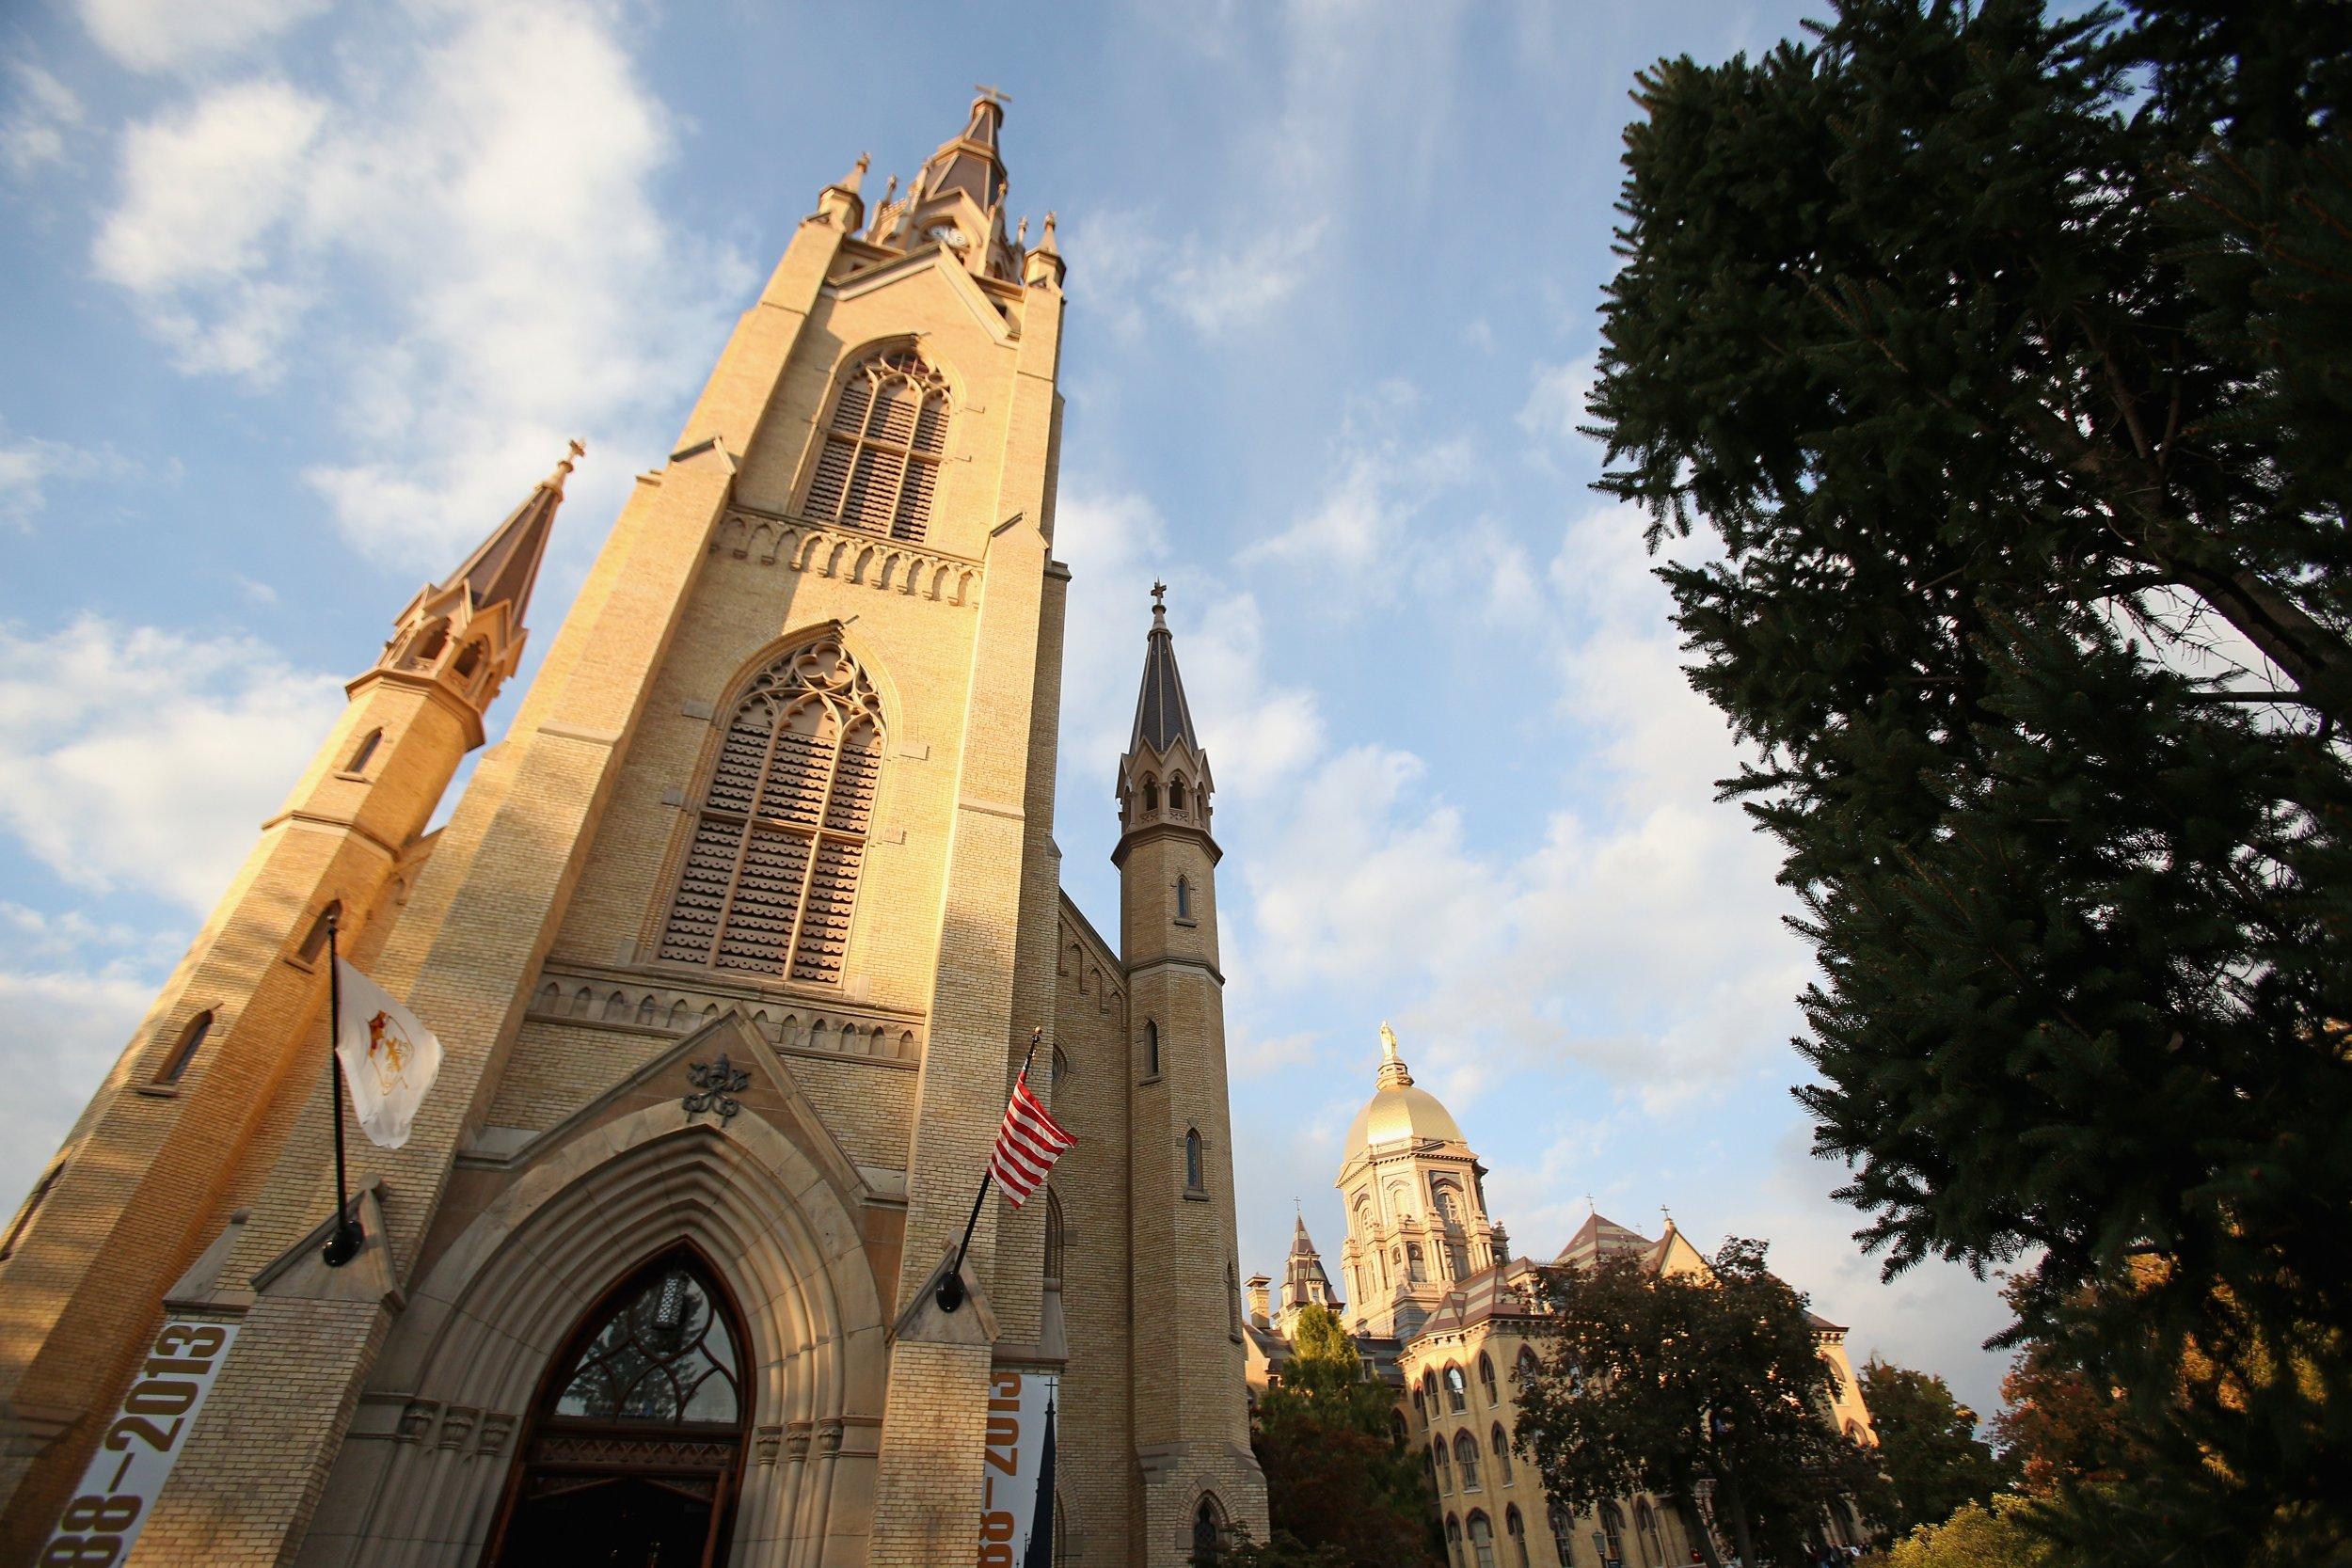 Notre dame catholic university pornographic websites ban